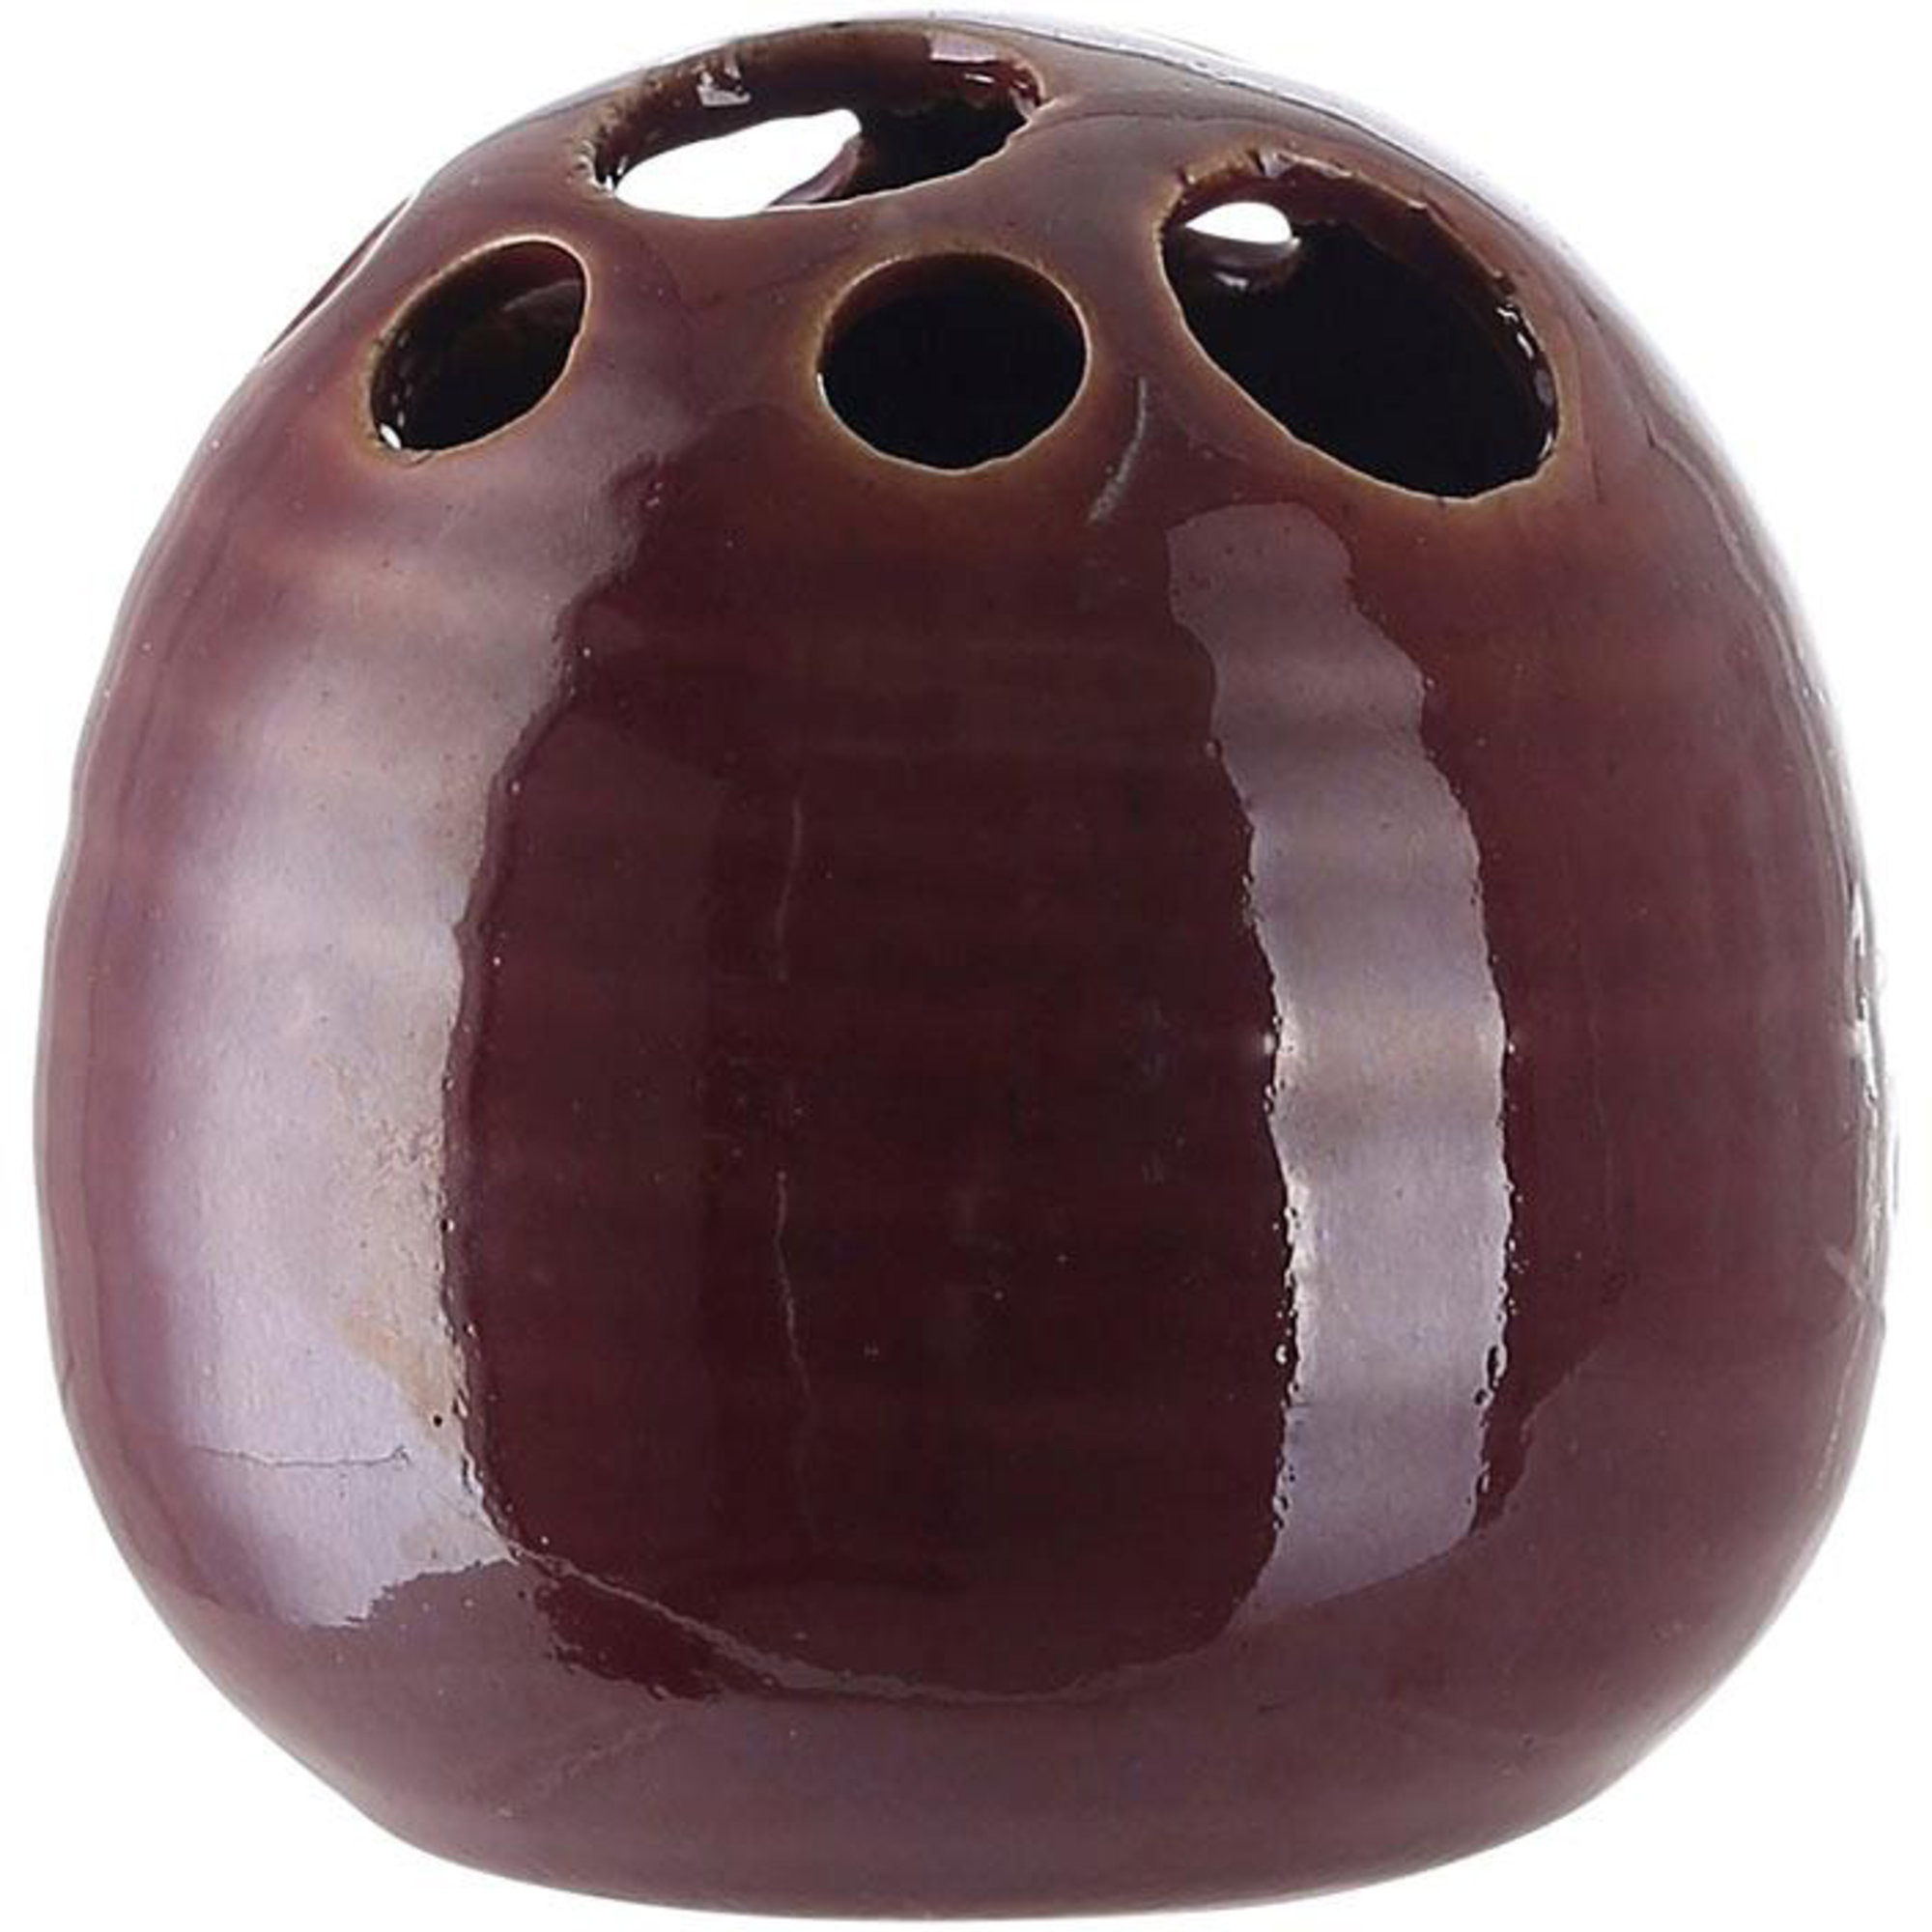 A Simple Mess Vas Fnug 10 cm Ø9,5 cm Wineta